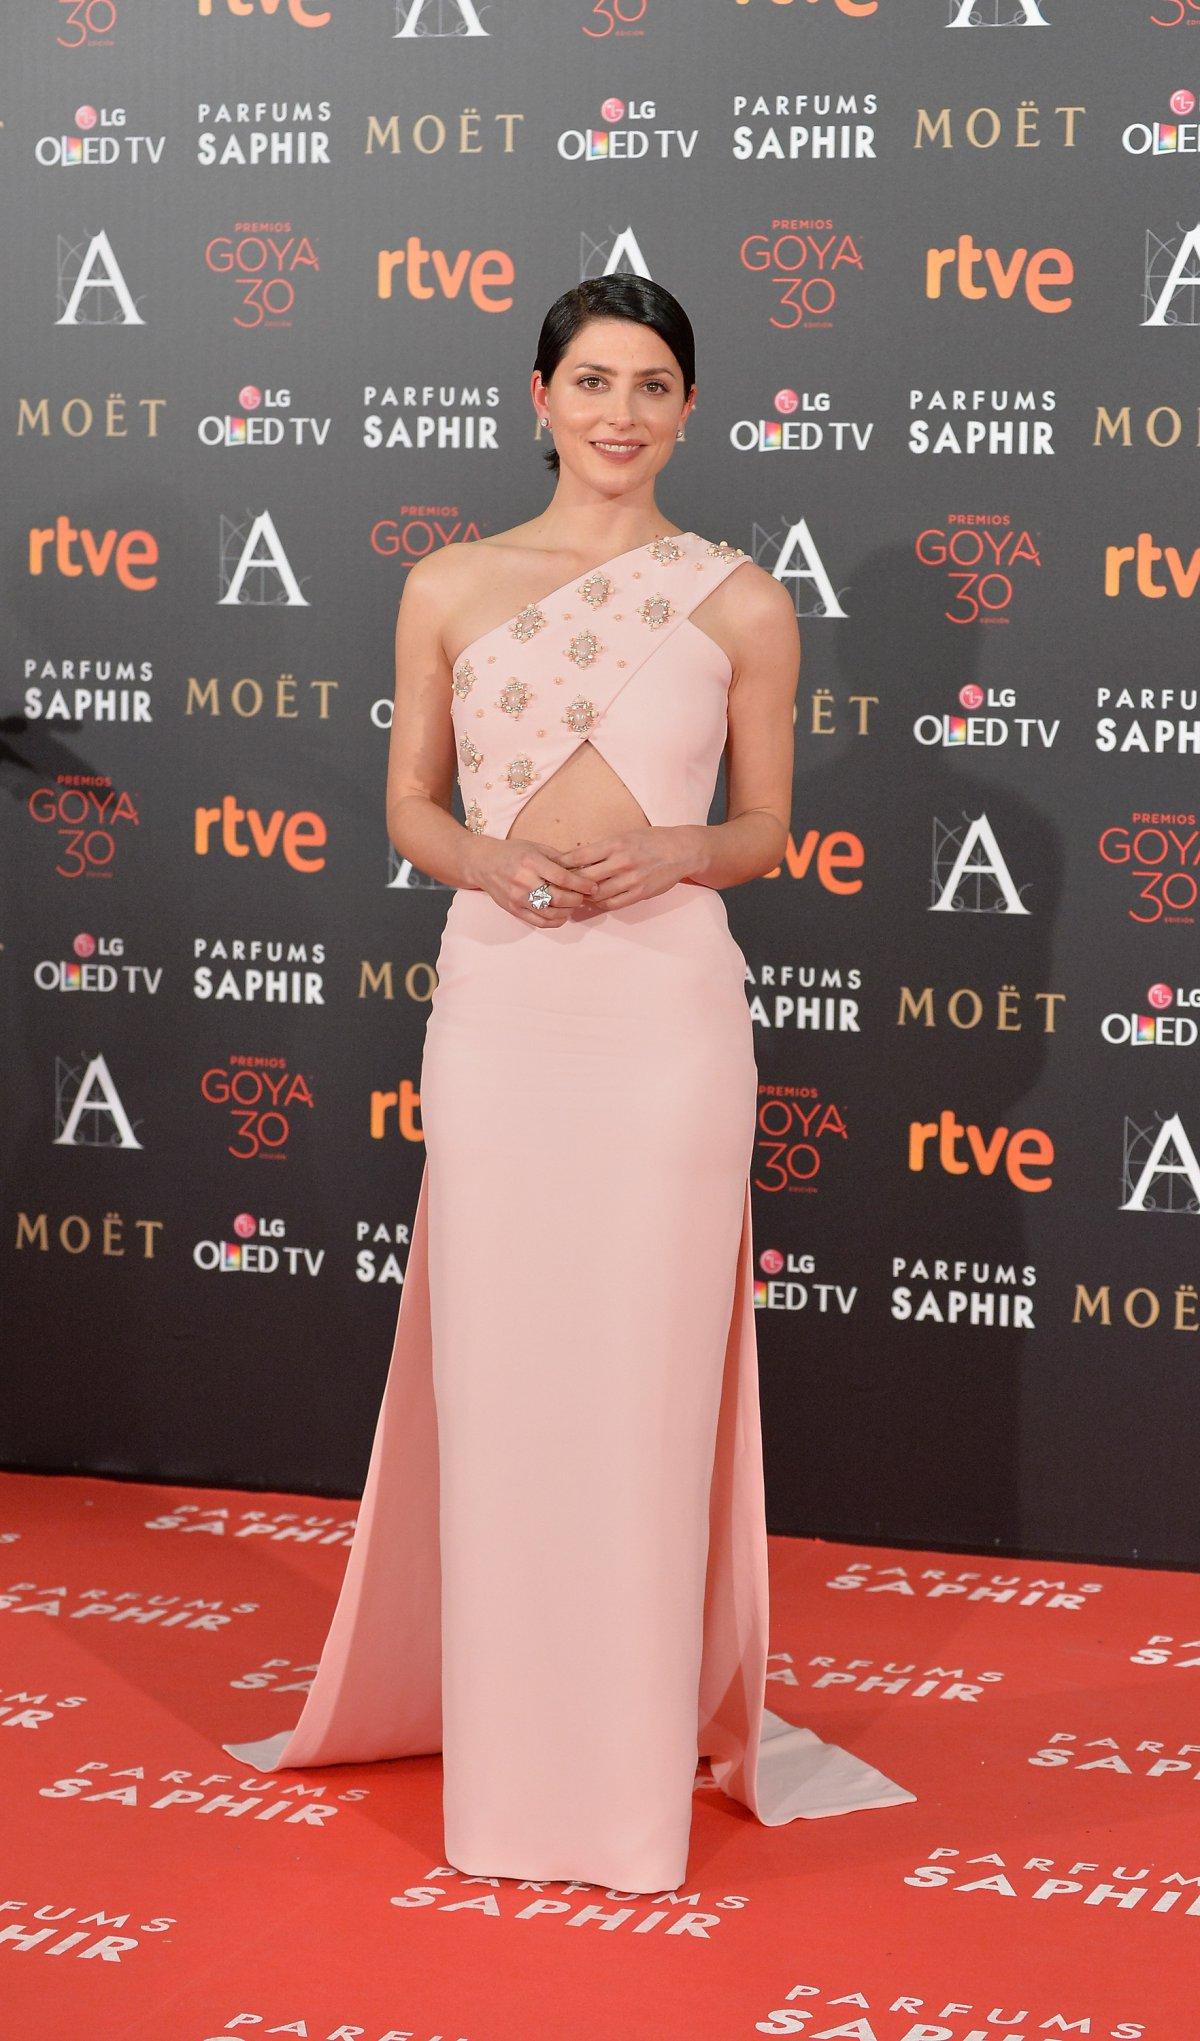 Dorable Vestidos De Fiesta Kylie Jenner Modelo - Ideas de Estilos de ...